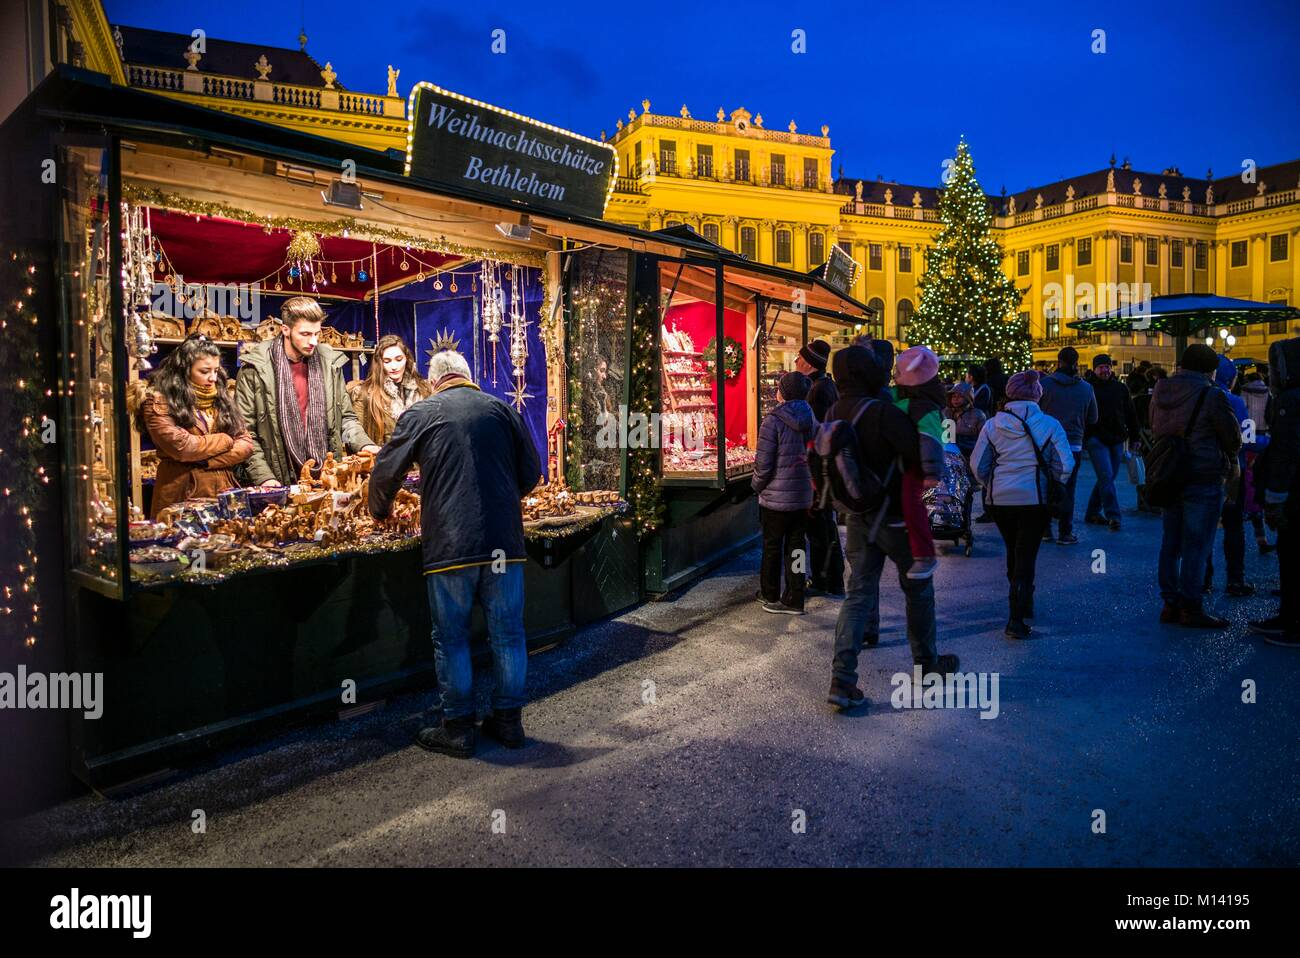 Austria, Vienna, Schonbrunn Palace, Christmas Market, evening - Stock Image